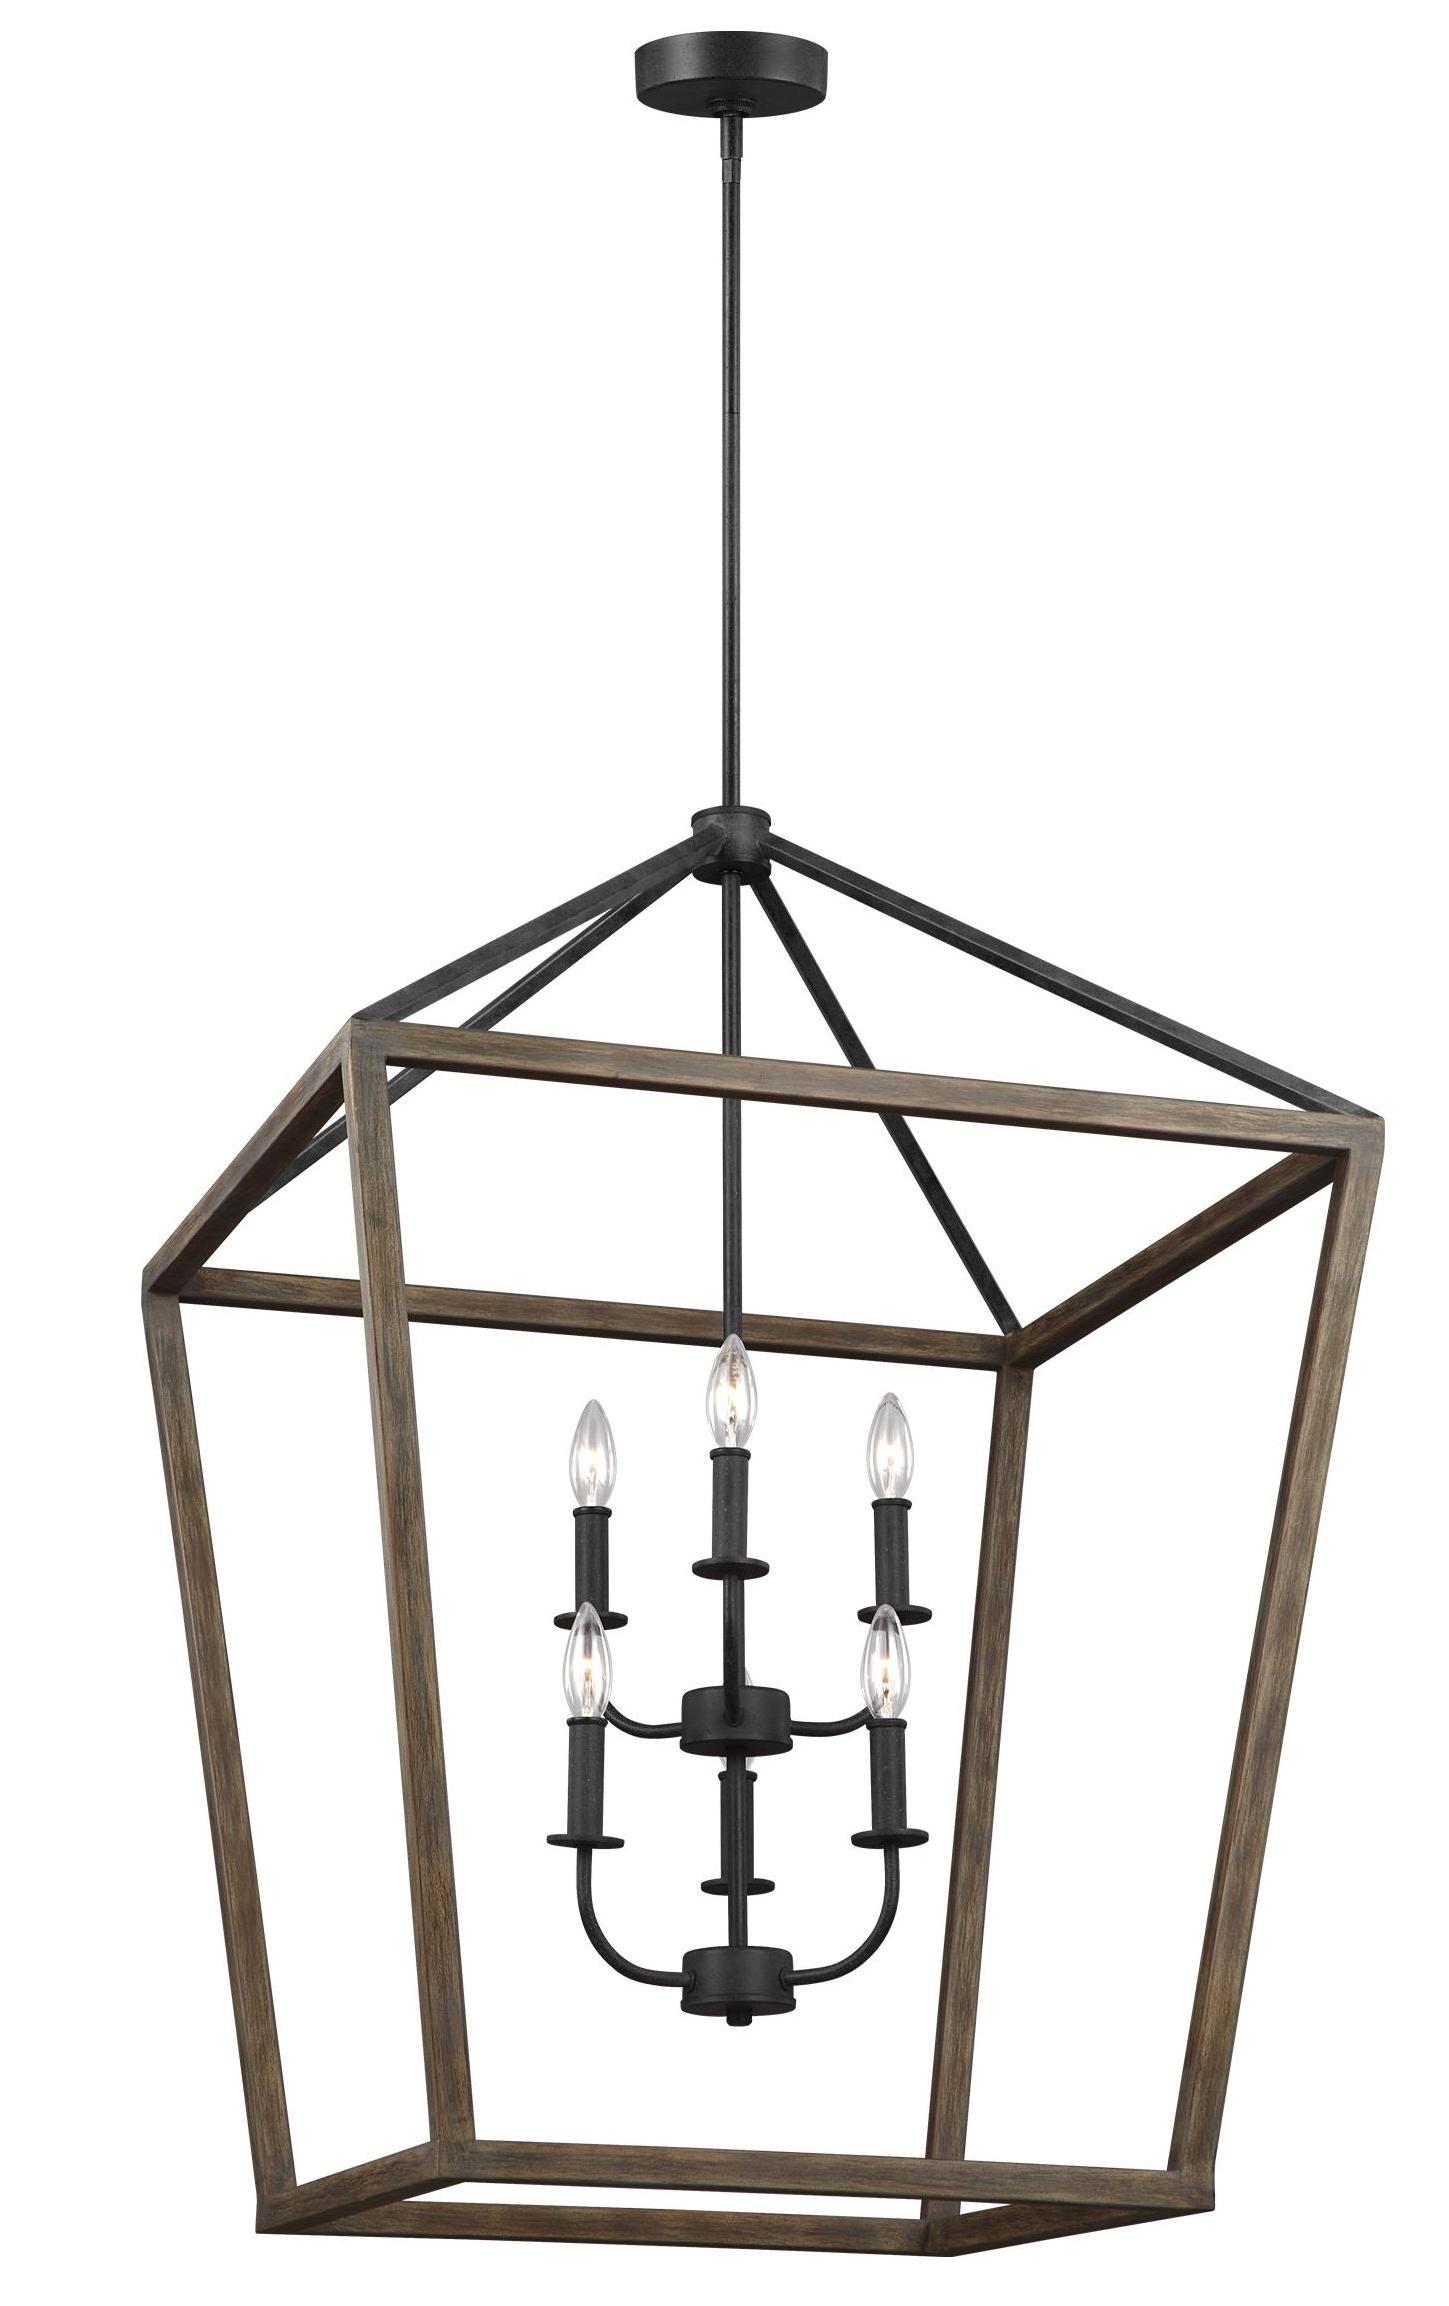 Natarsha 6 Light Lantern Geometric Pendant In Preferred Carmen 8 Light Lantern Tiered Pendants (View 23 of 25)